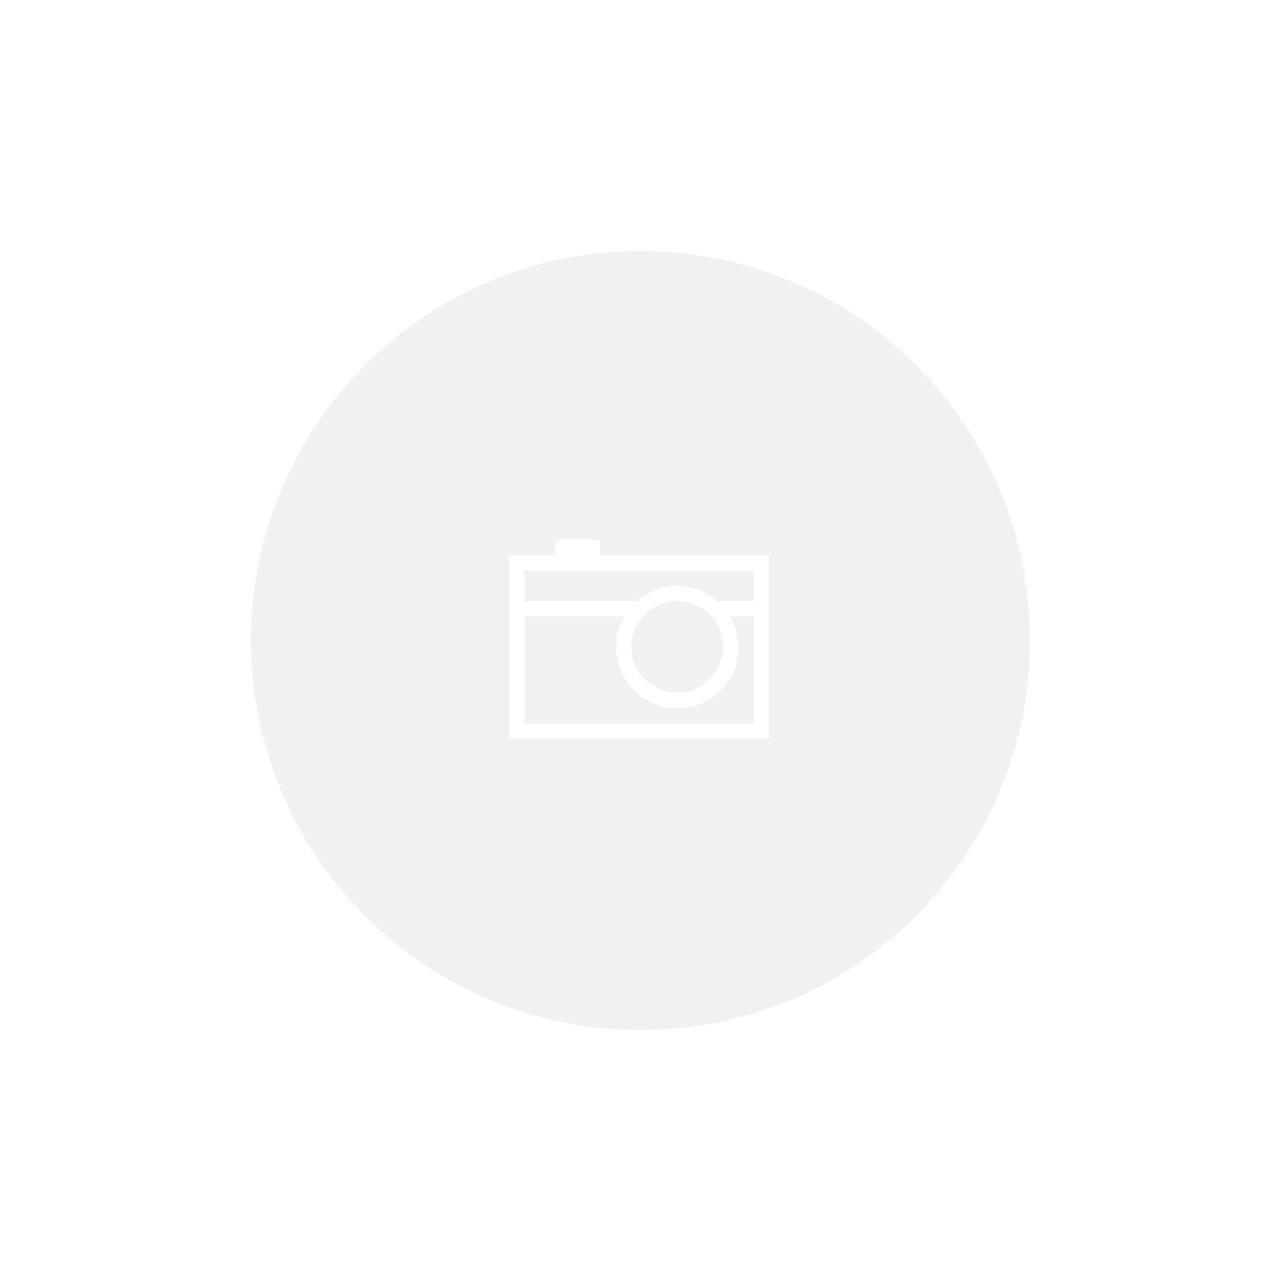 Papel Artesanal Indiano - Ref. 87